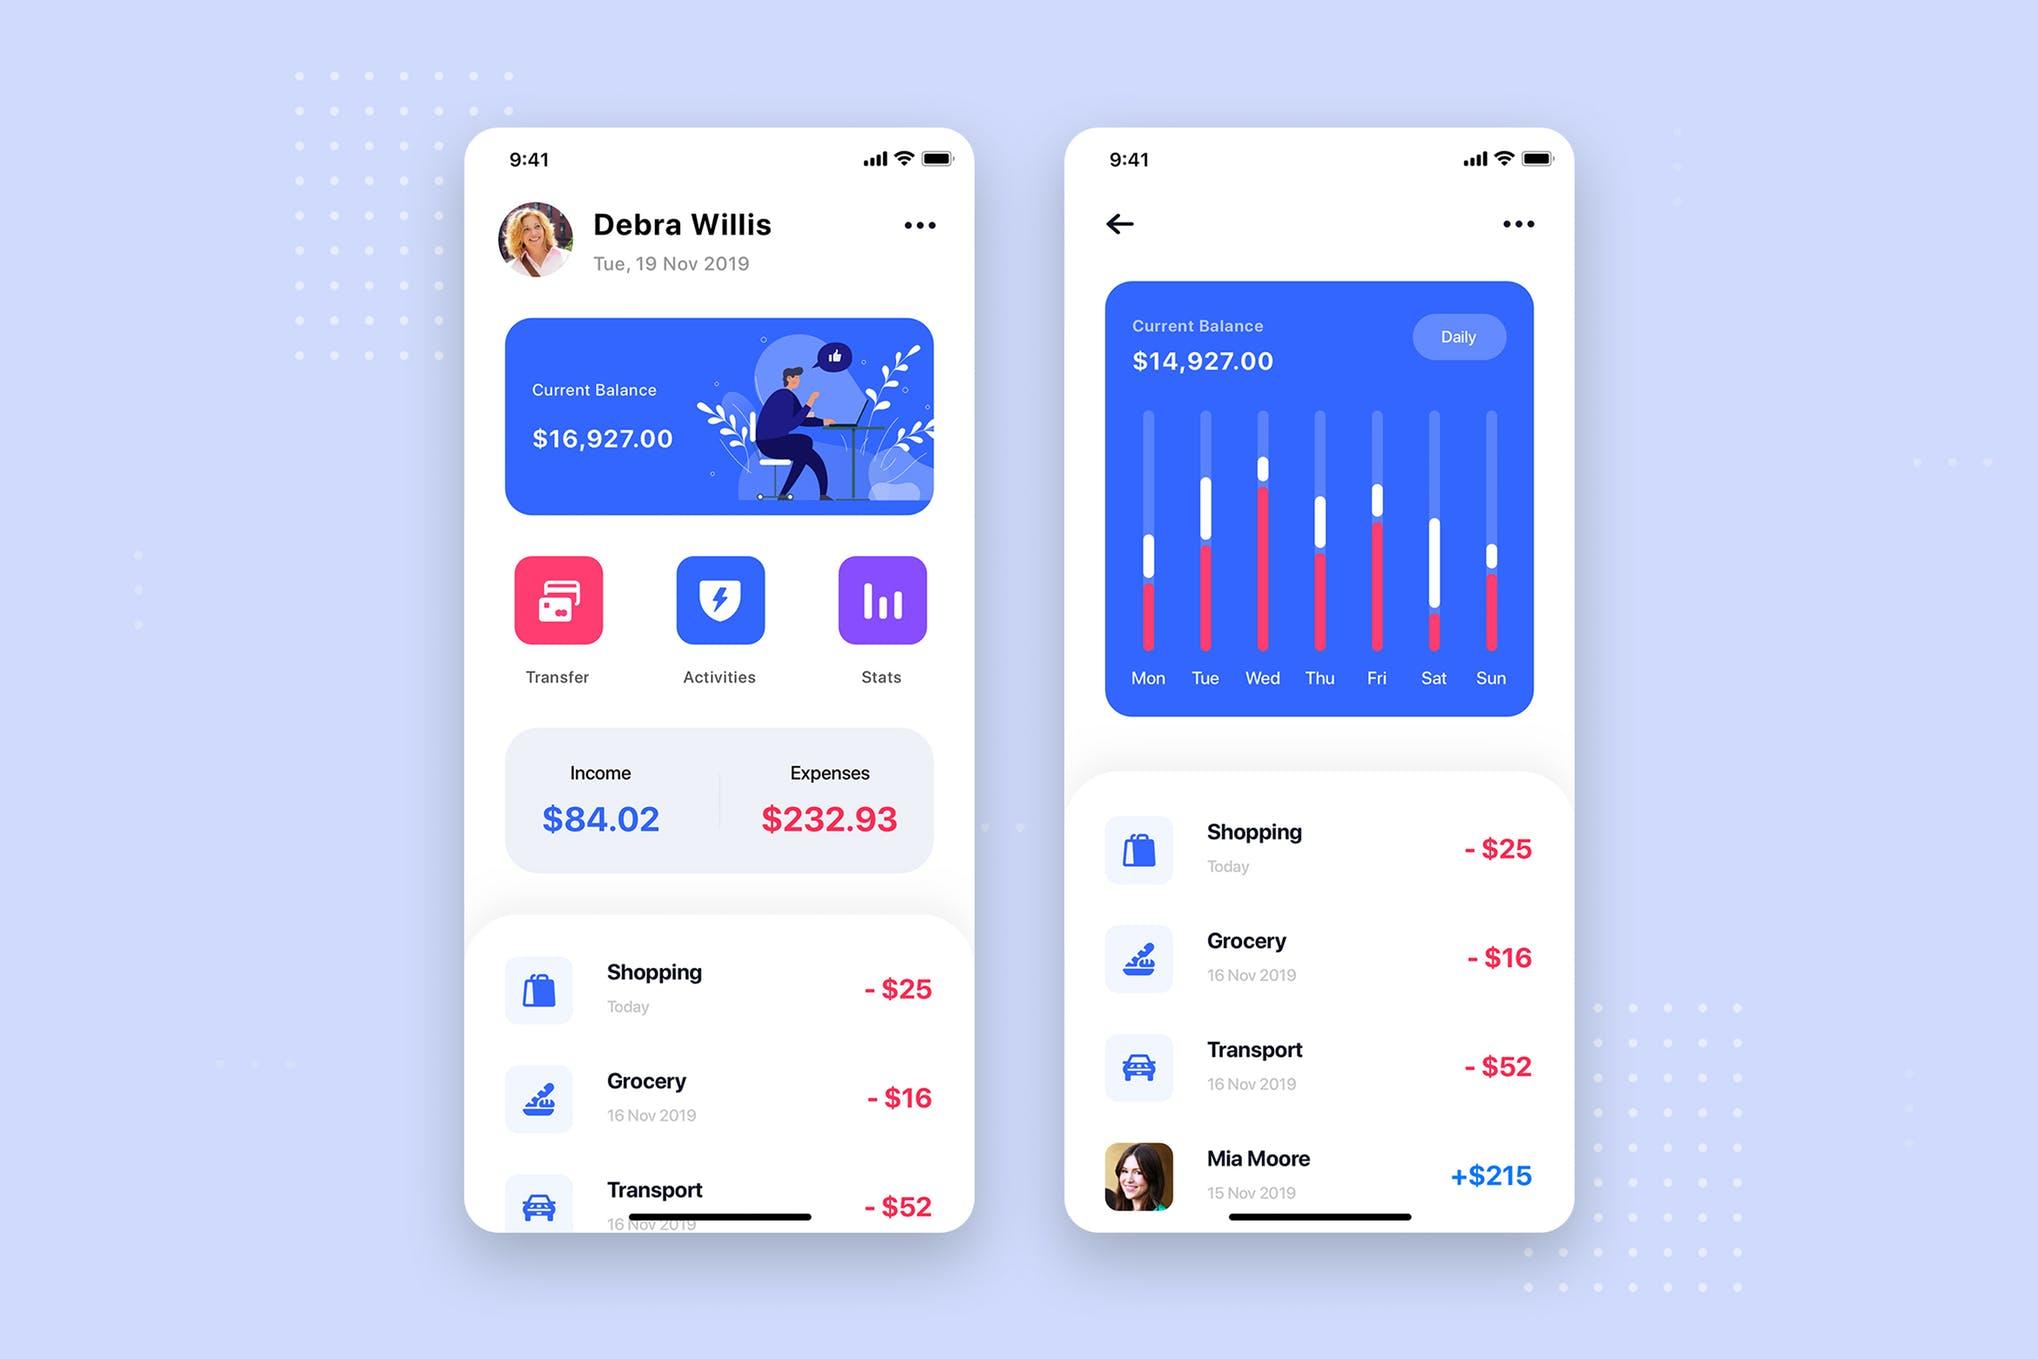 دانلود UI Kit اپلیکیشن موبایل Mobile Banking UI Kit Template